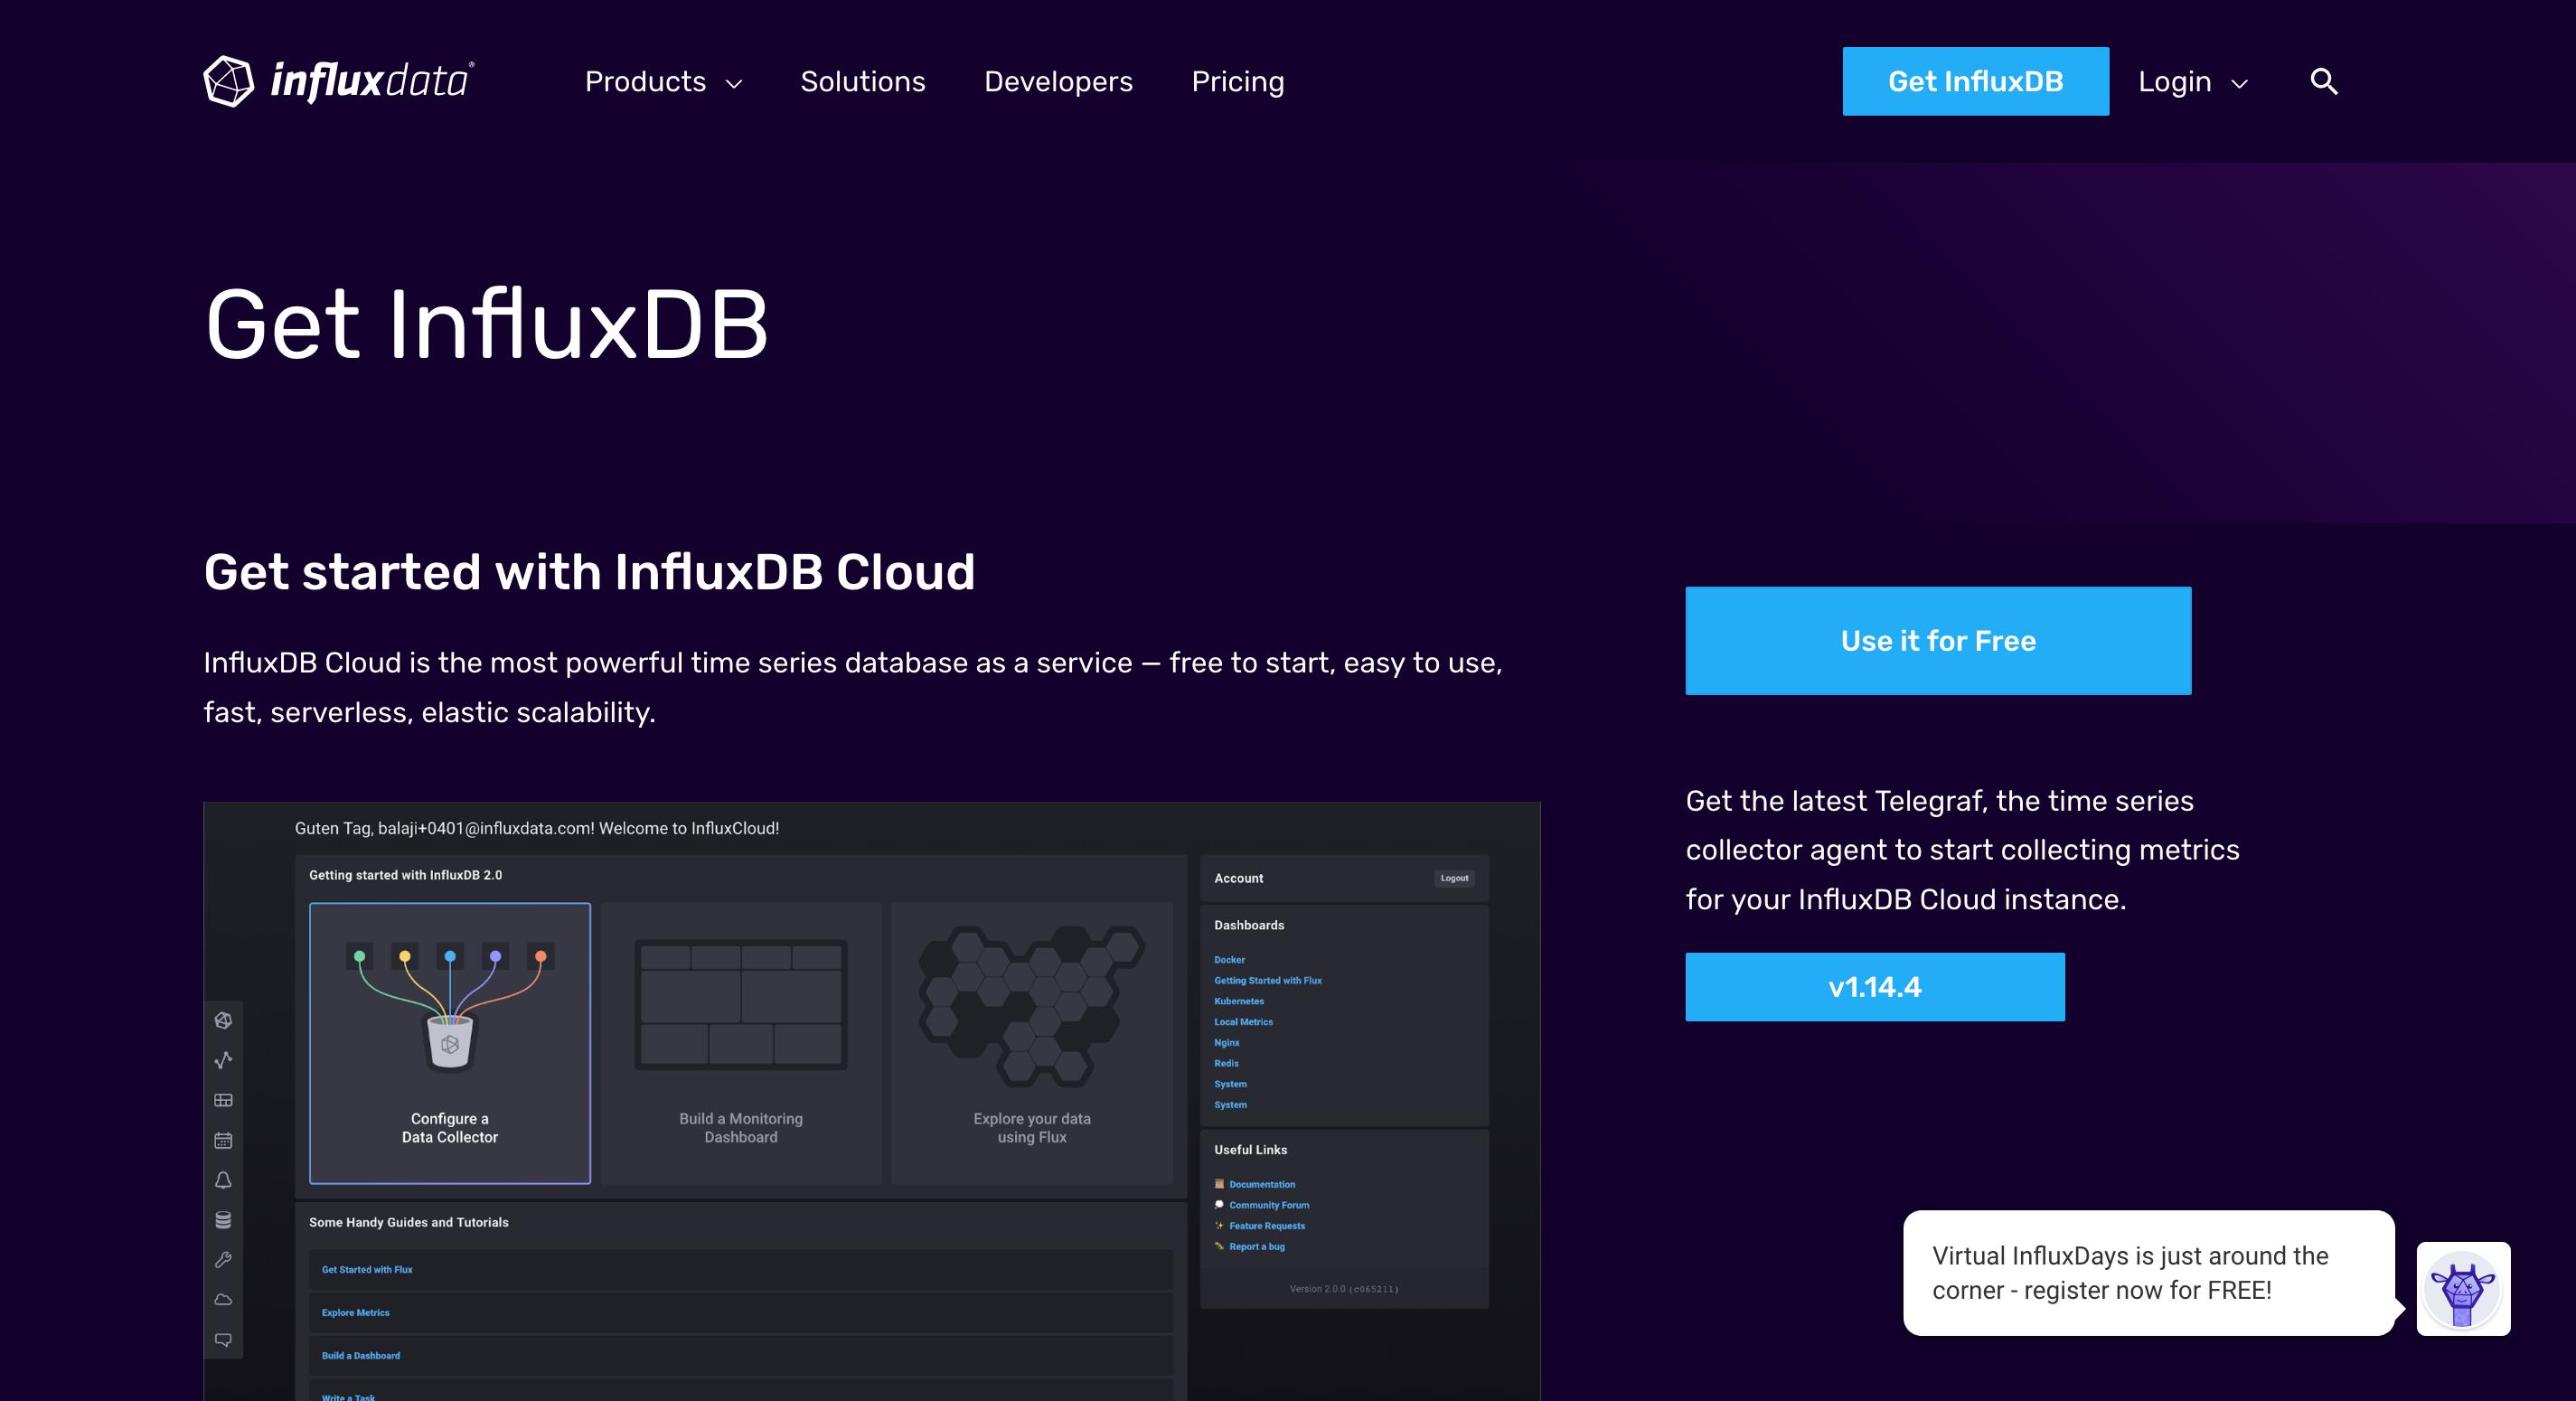 Get InfluxDB webpage